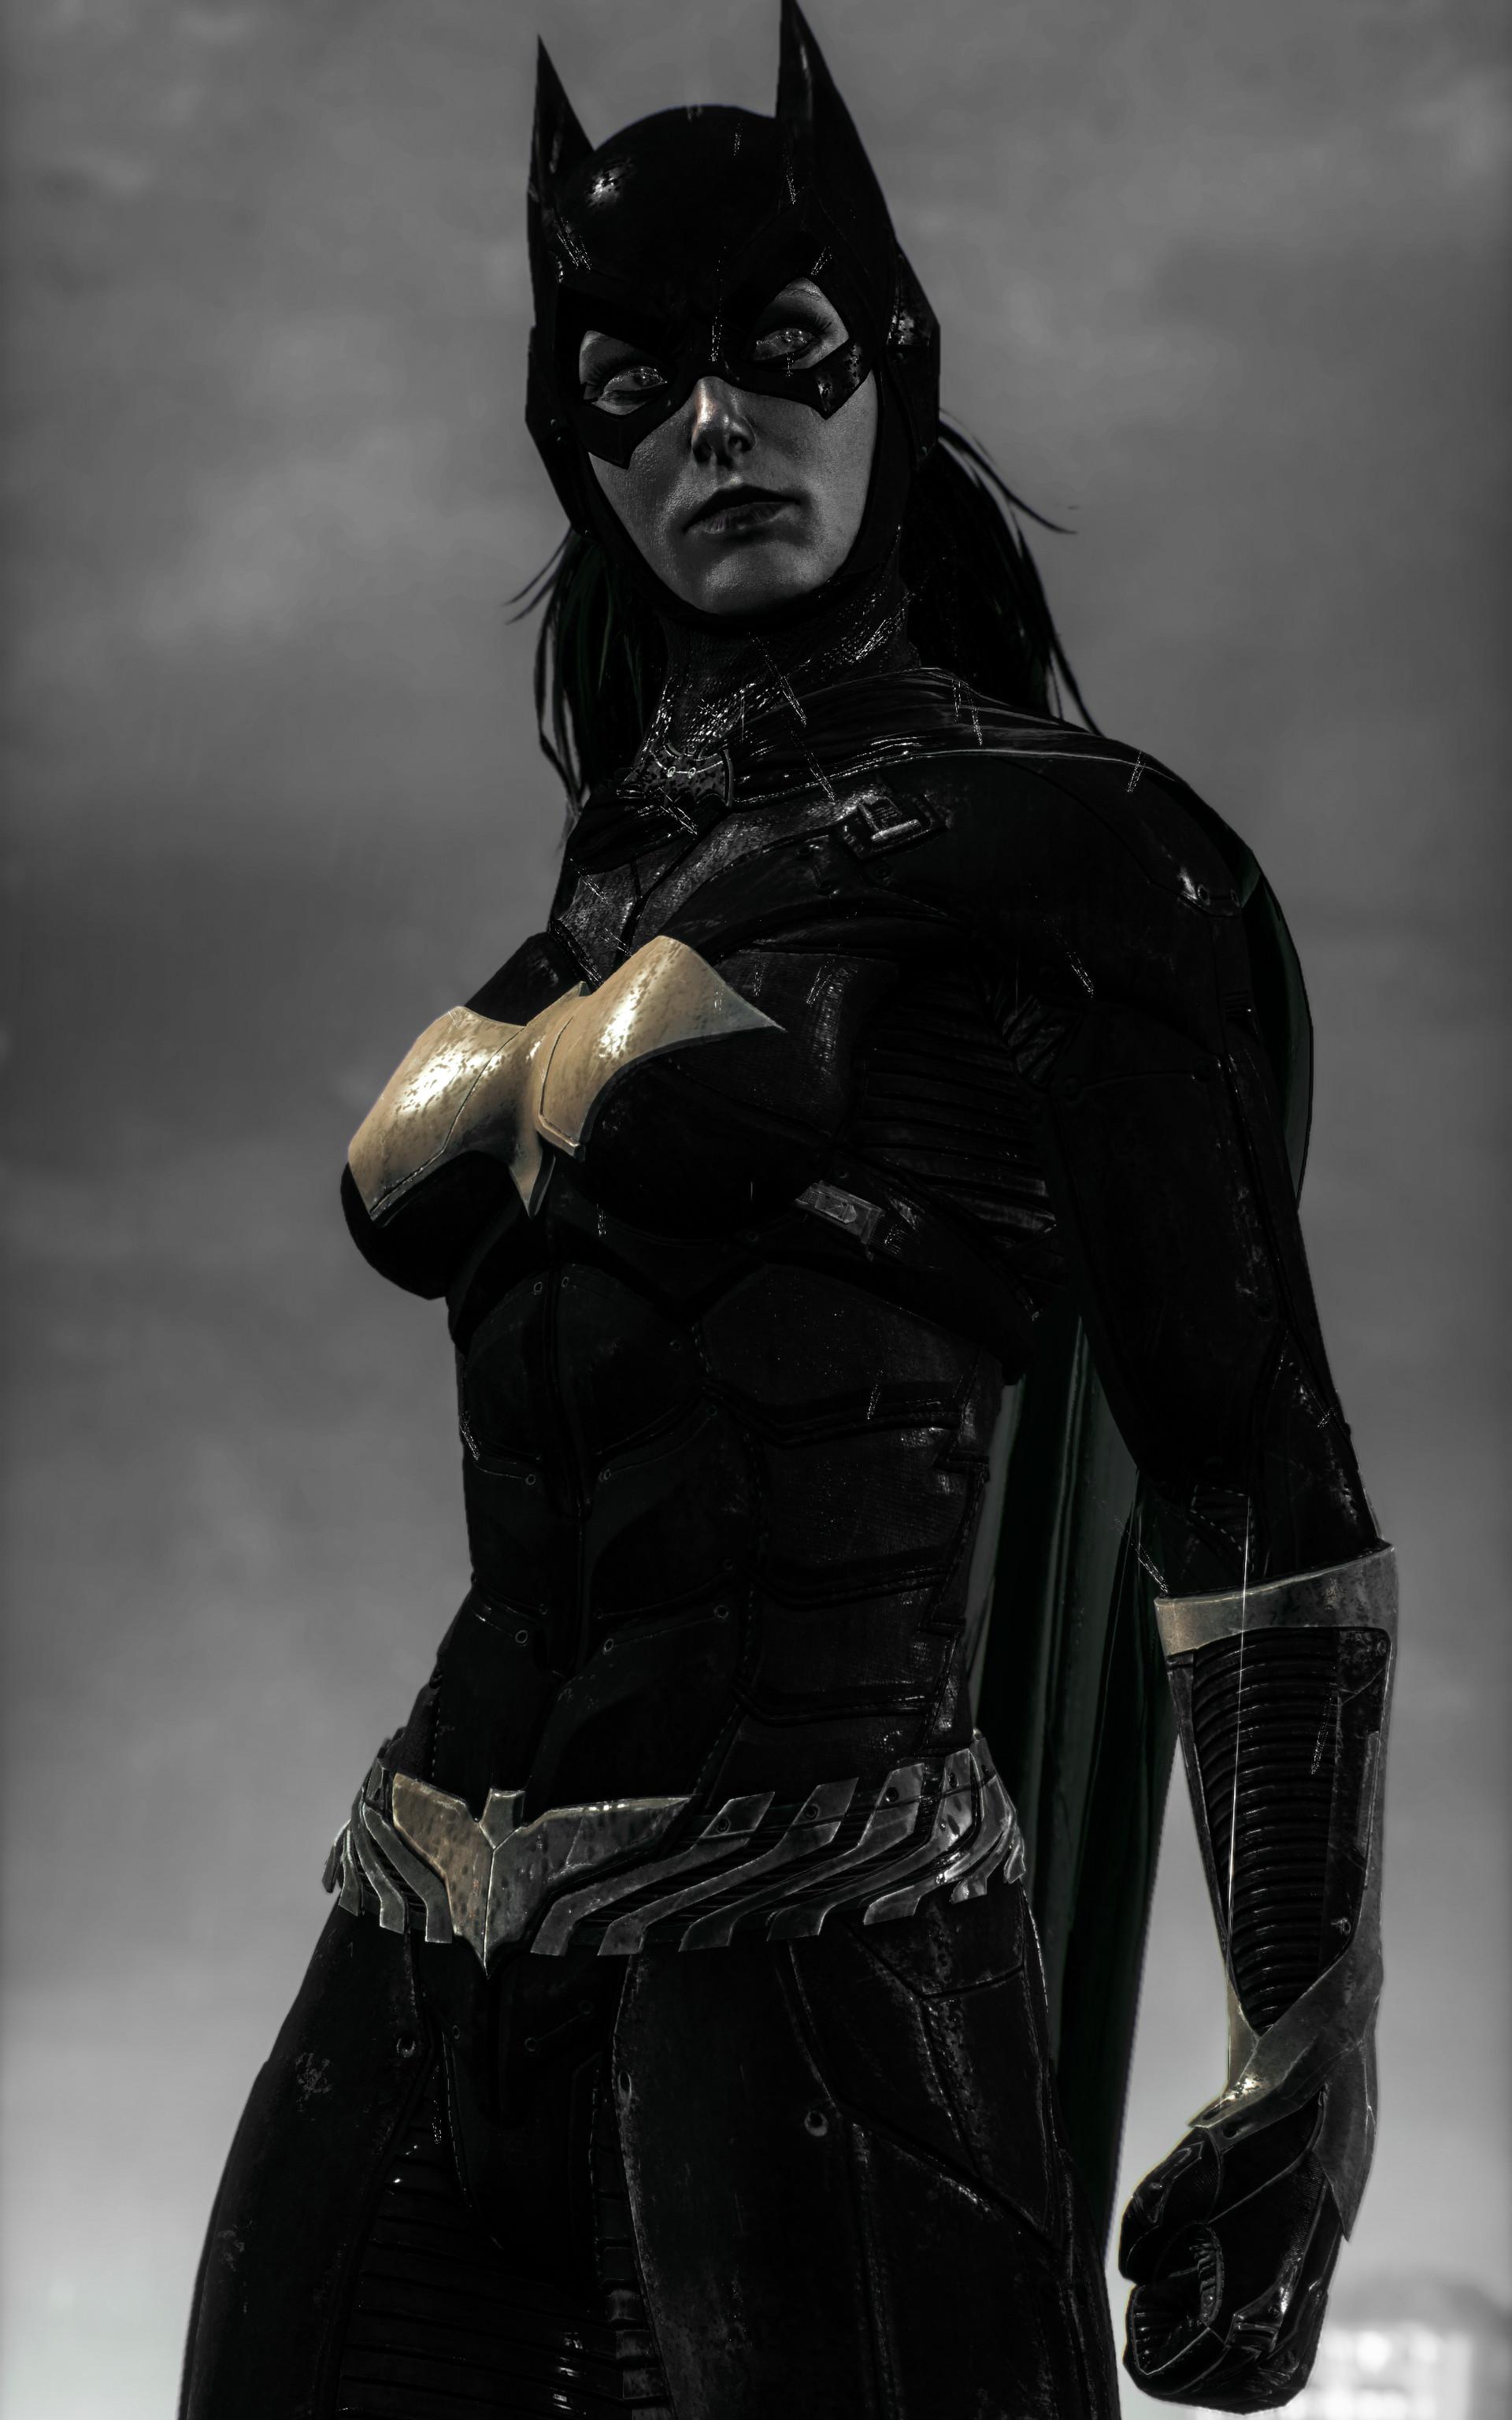 25293288907_ec6dcb7331_3k.jpg - Batman: Arkham Knight